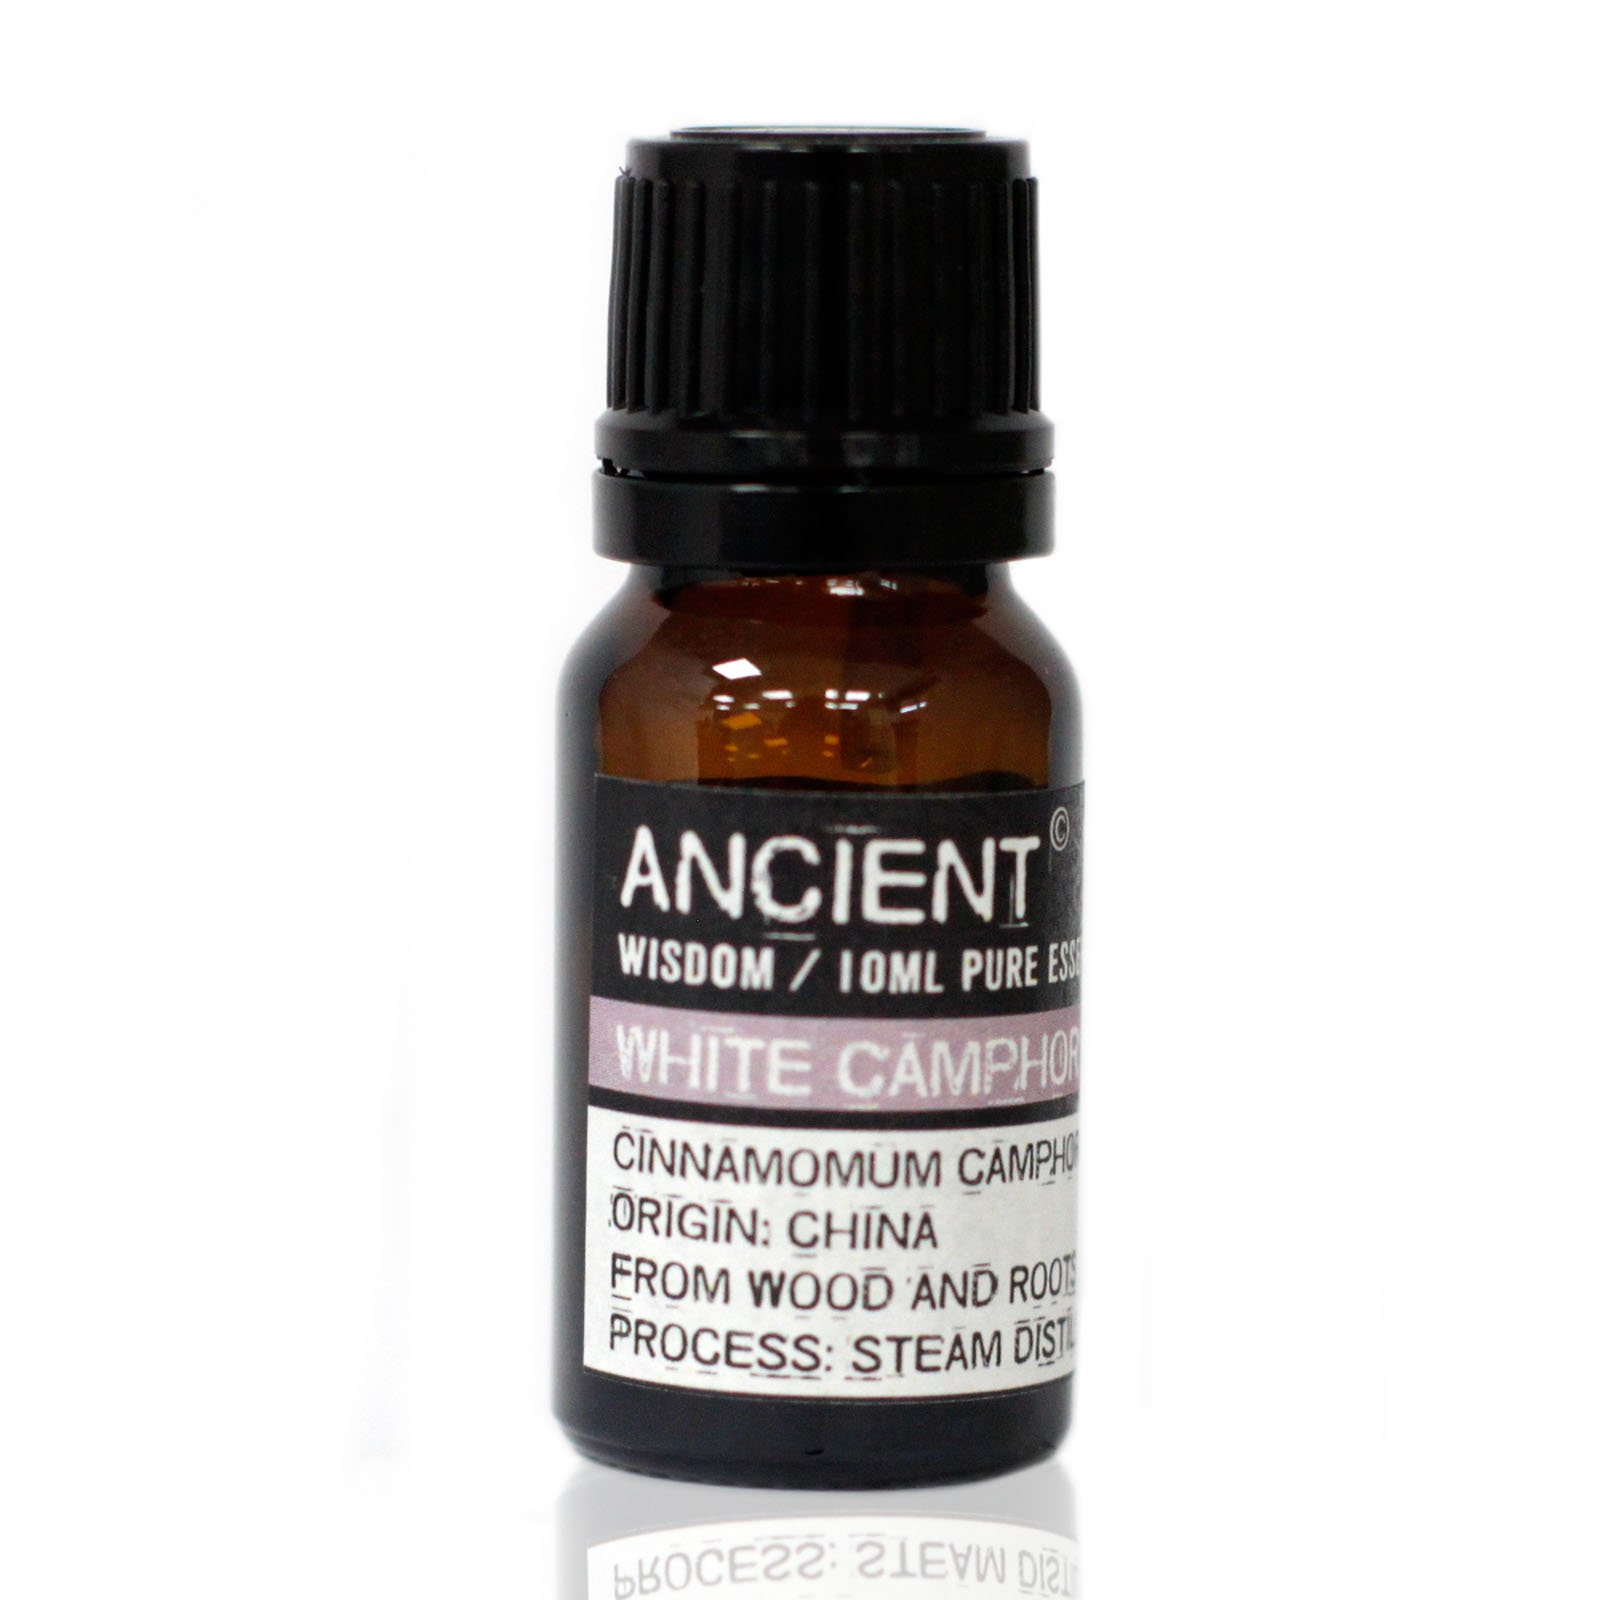 ulei de camfor pentru dureri articulare amelioreaza durerea articulara decat